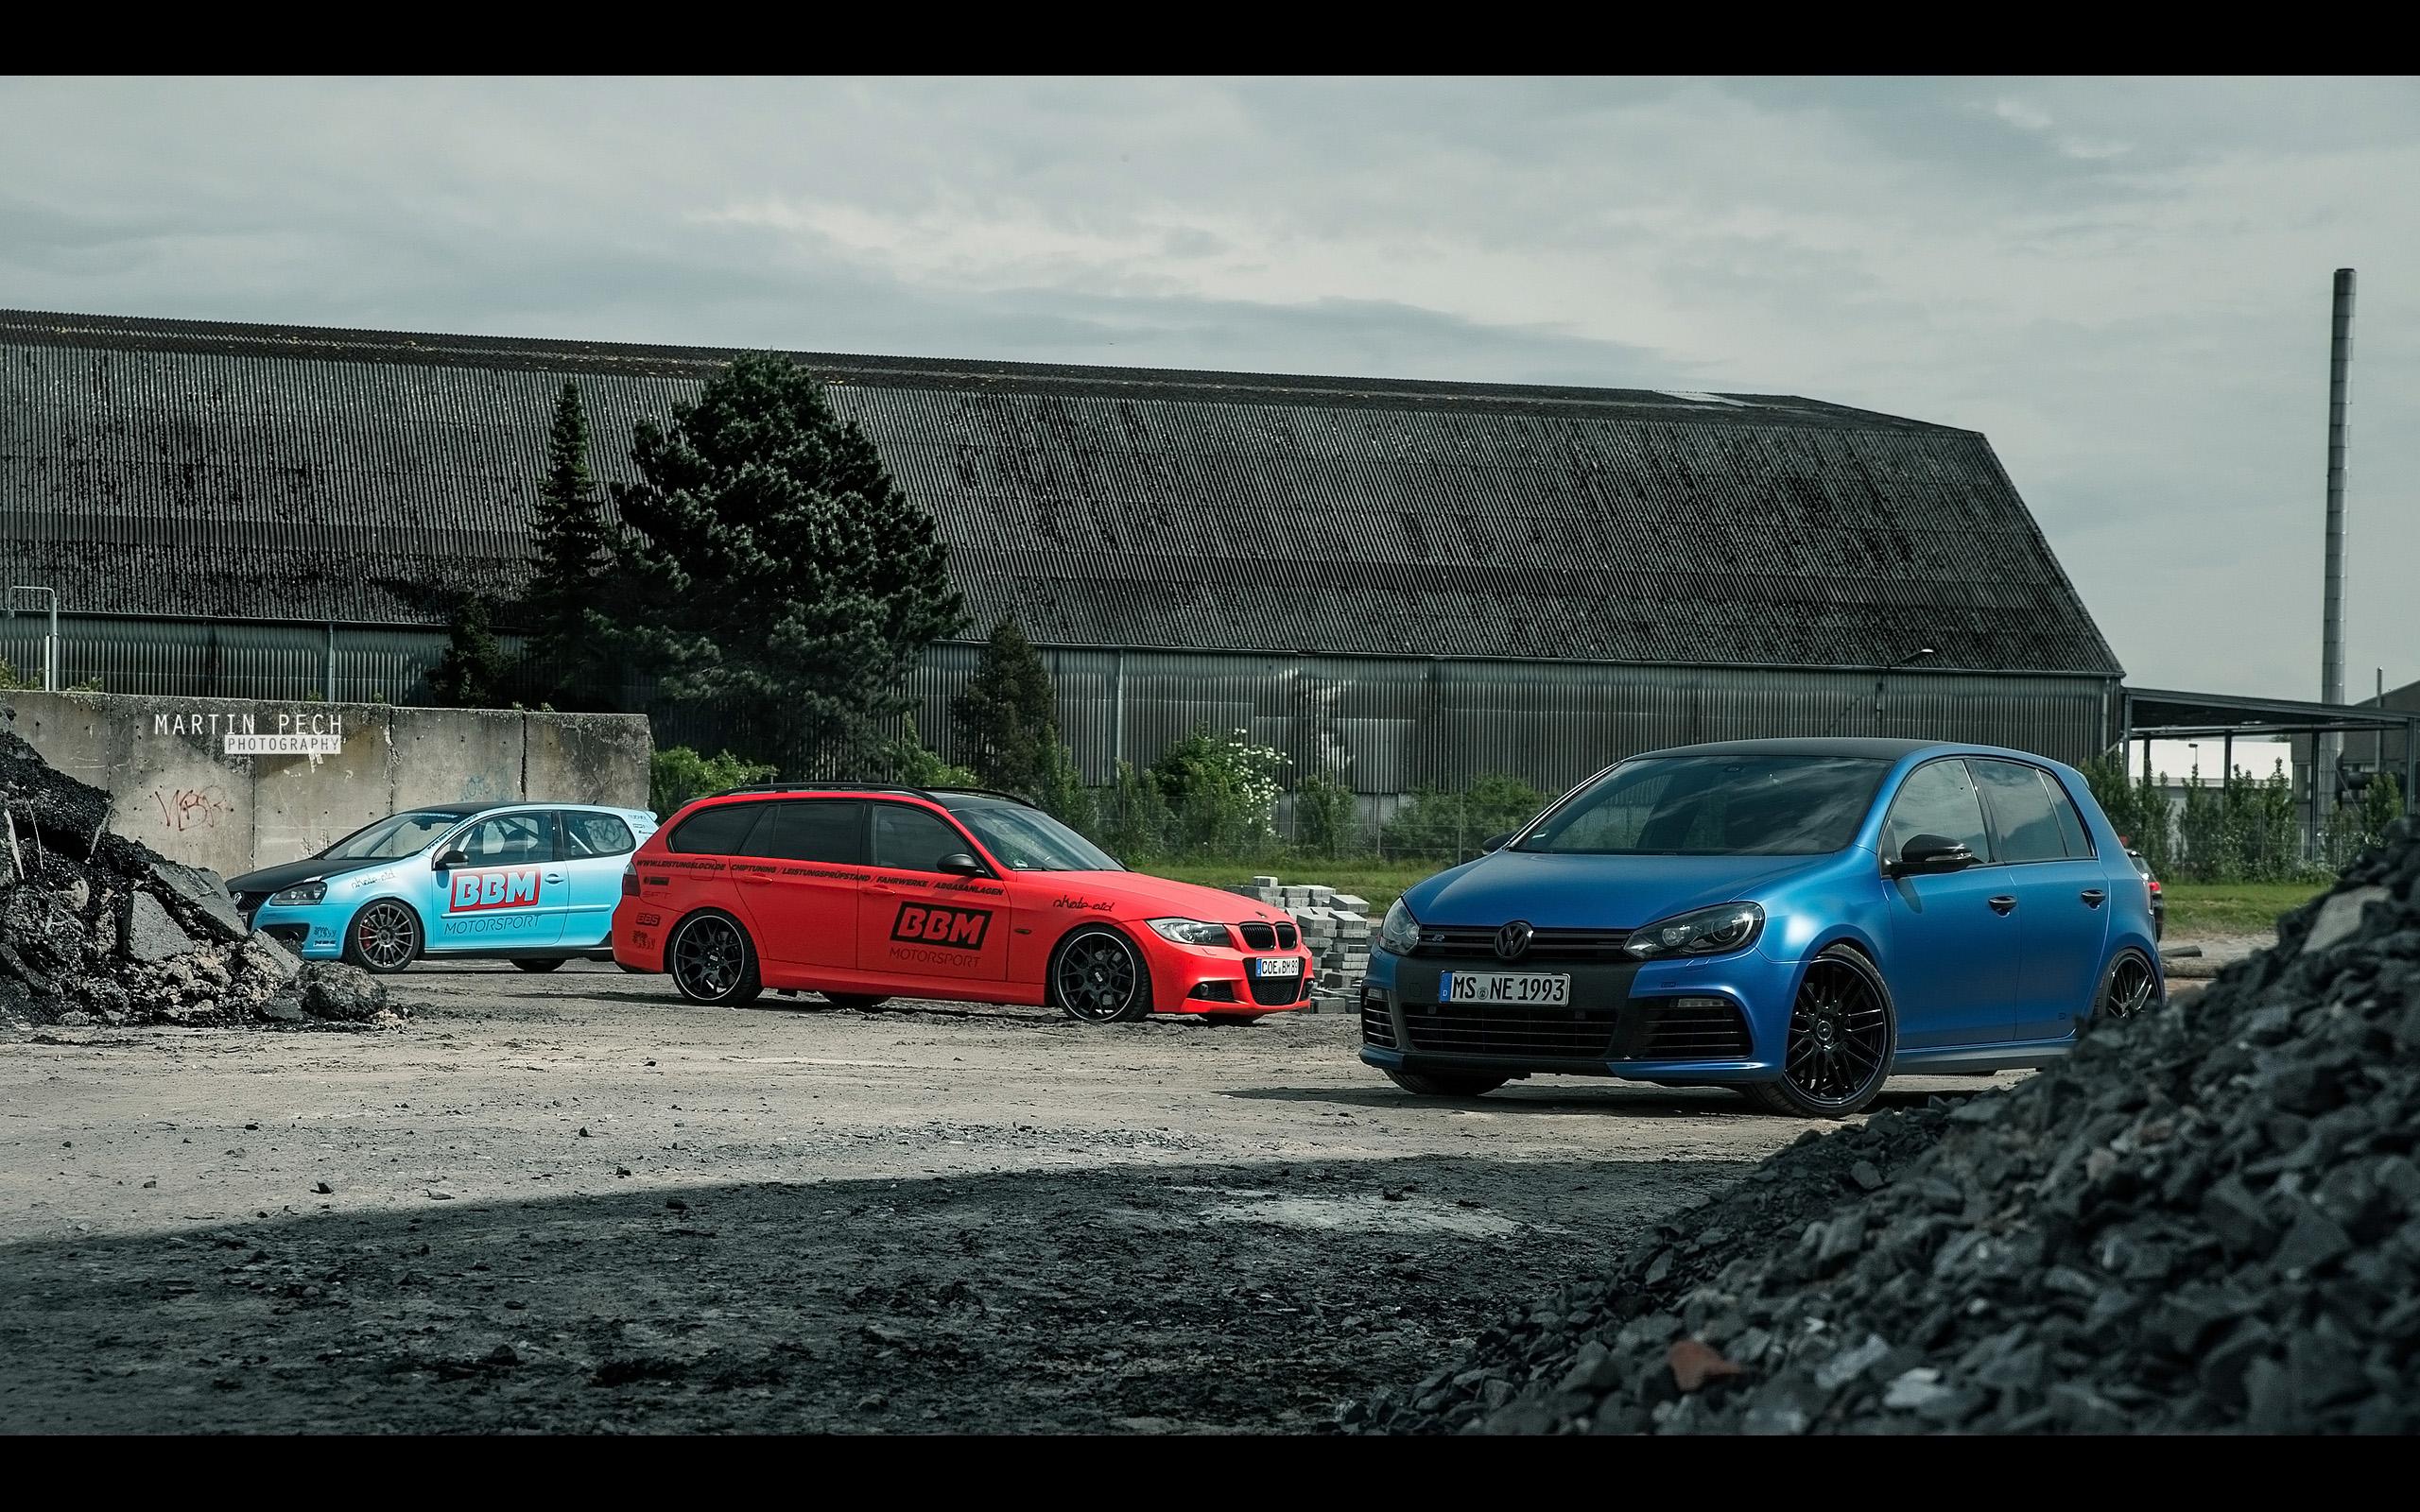 2013_BBM_Motorsport_BMW_E91_330d_tuning_nl_2560x1600.jpg